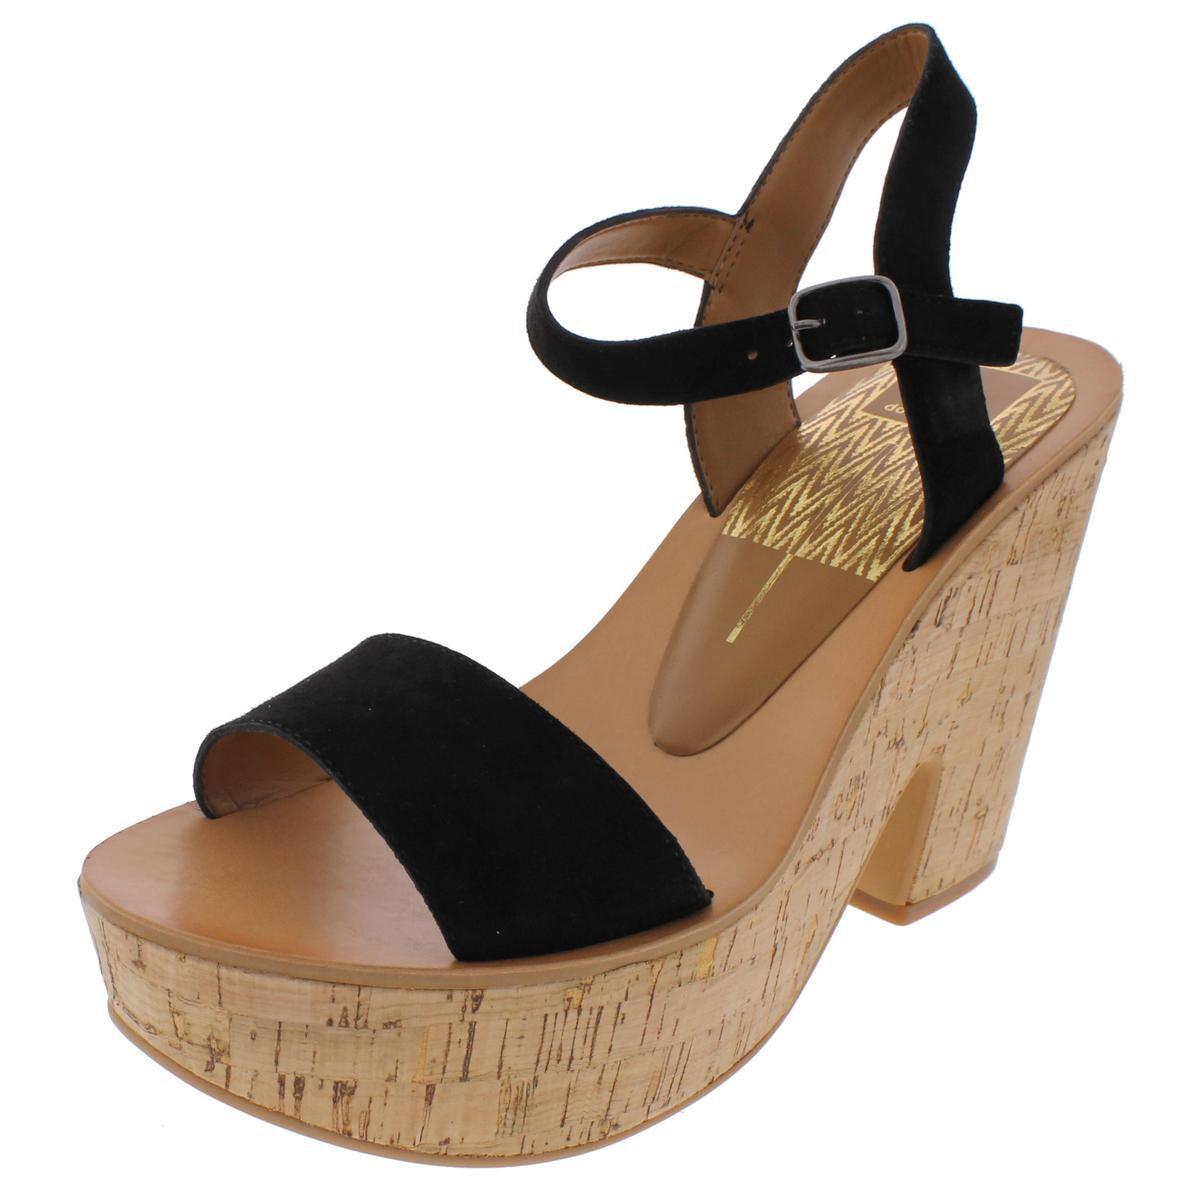 ca22009cda1 Lyst - Dolce Vita Randi Cork Open Toe Platform Sandals